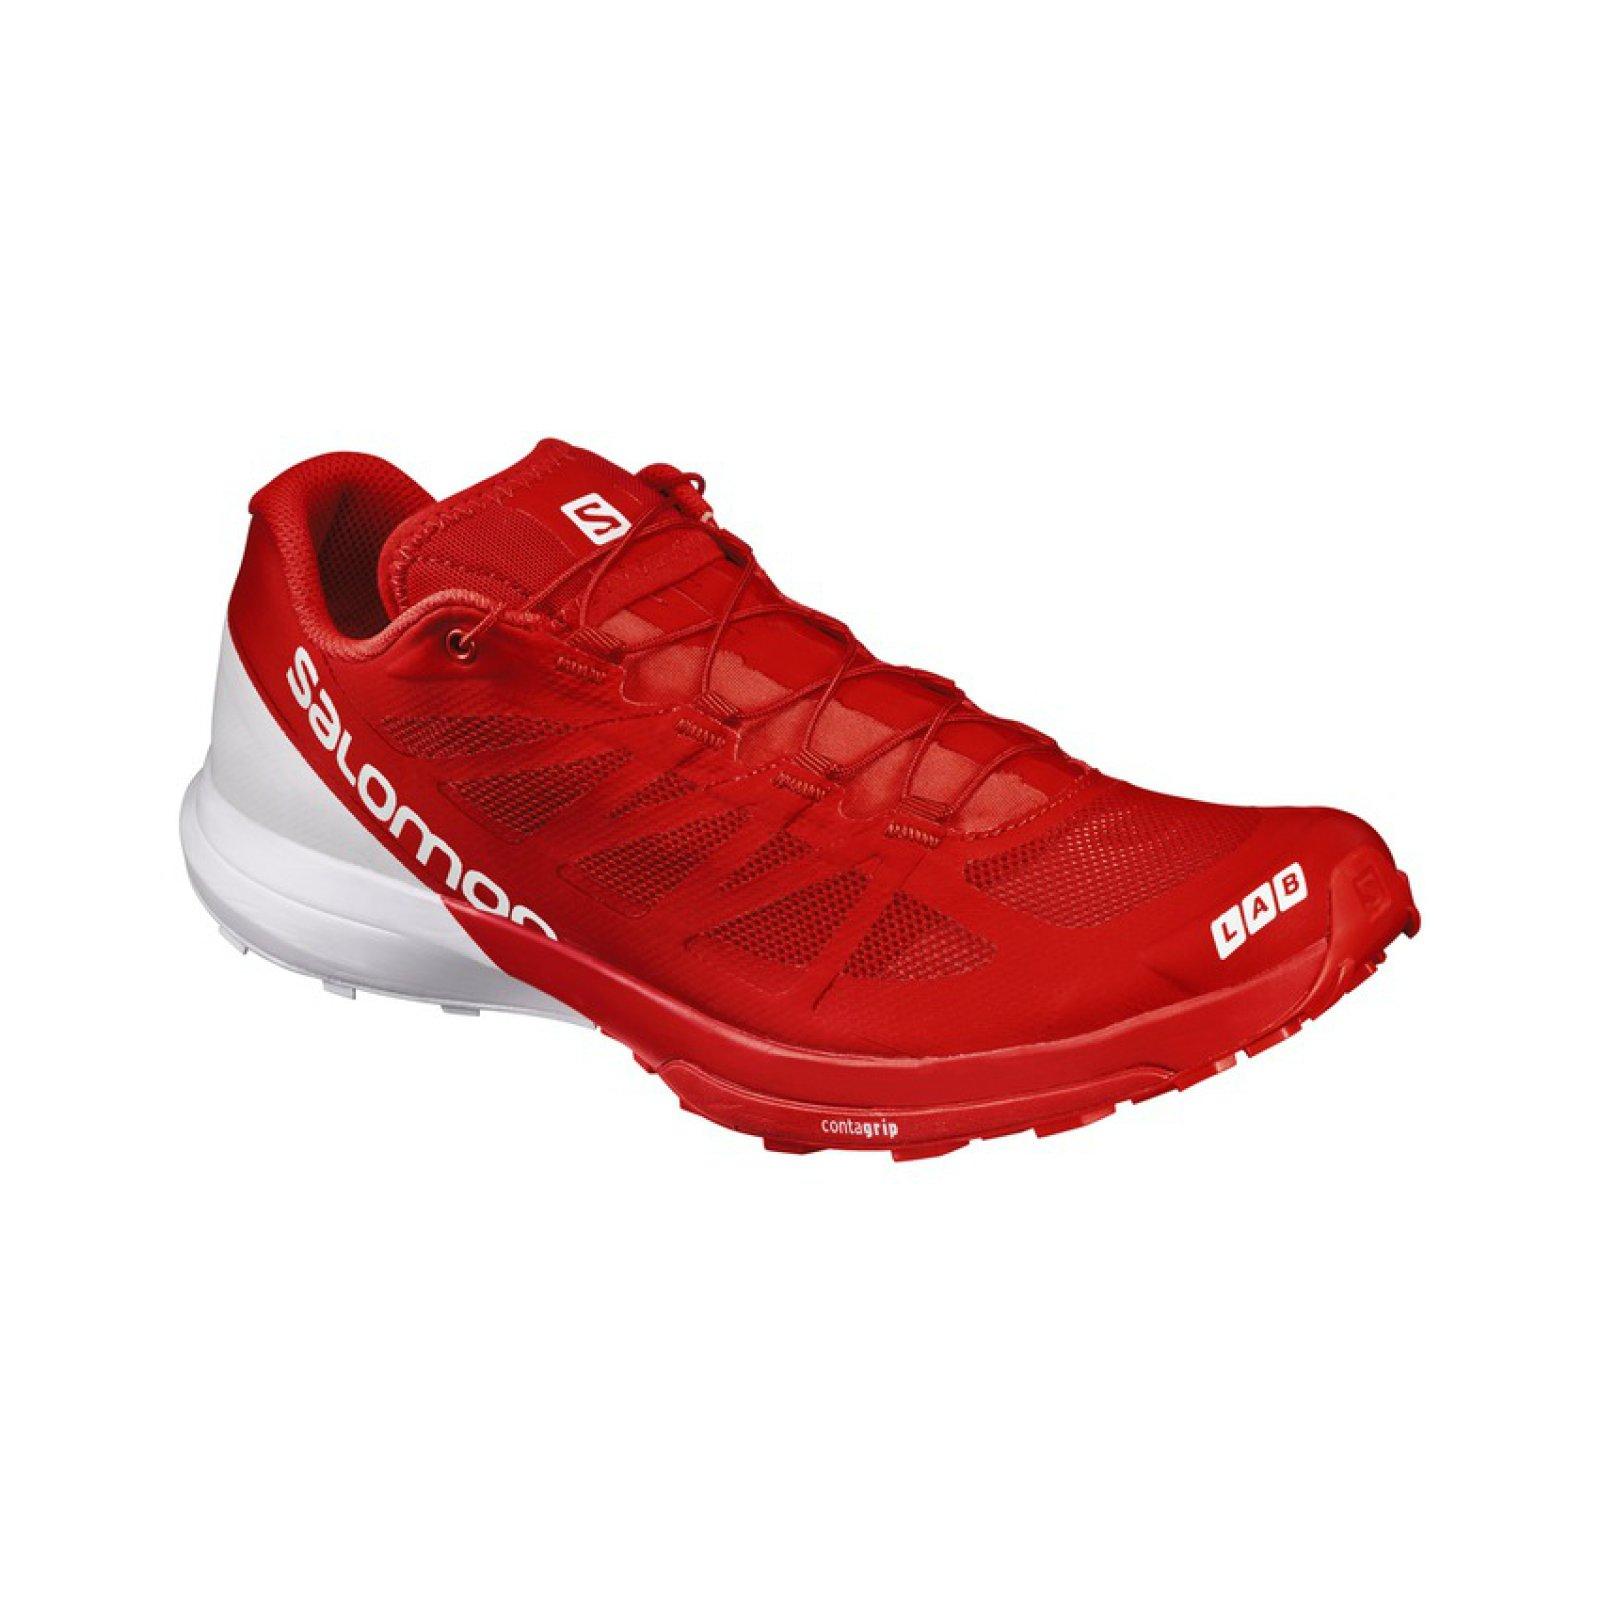 Trailové běžecké boty Salomon S-LAB Sense 6 Racing M L39176500 ... 33445c2db92